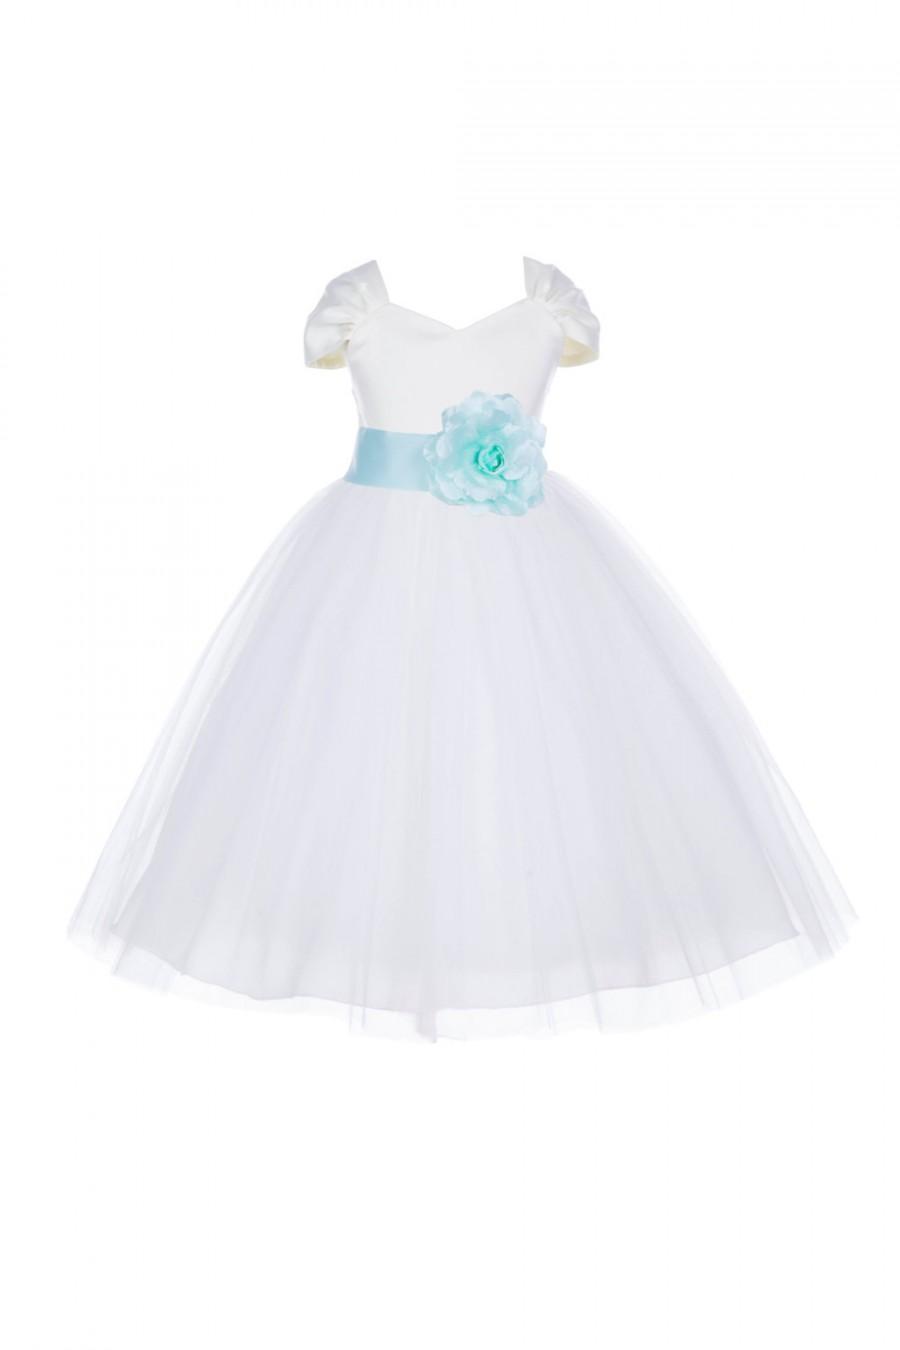 Mariage - Short sleeves Ivory Flower Girl dress V-shaped neckline pageant wedding bridal recital children tulle bridesmaid toddler 2 4 6 8 10 12